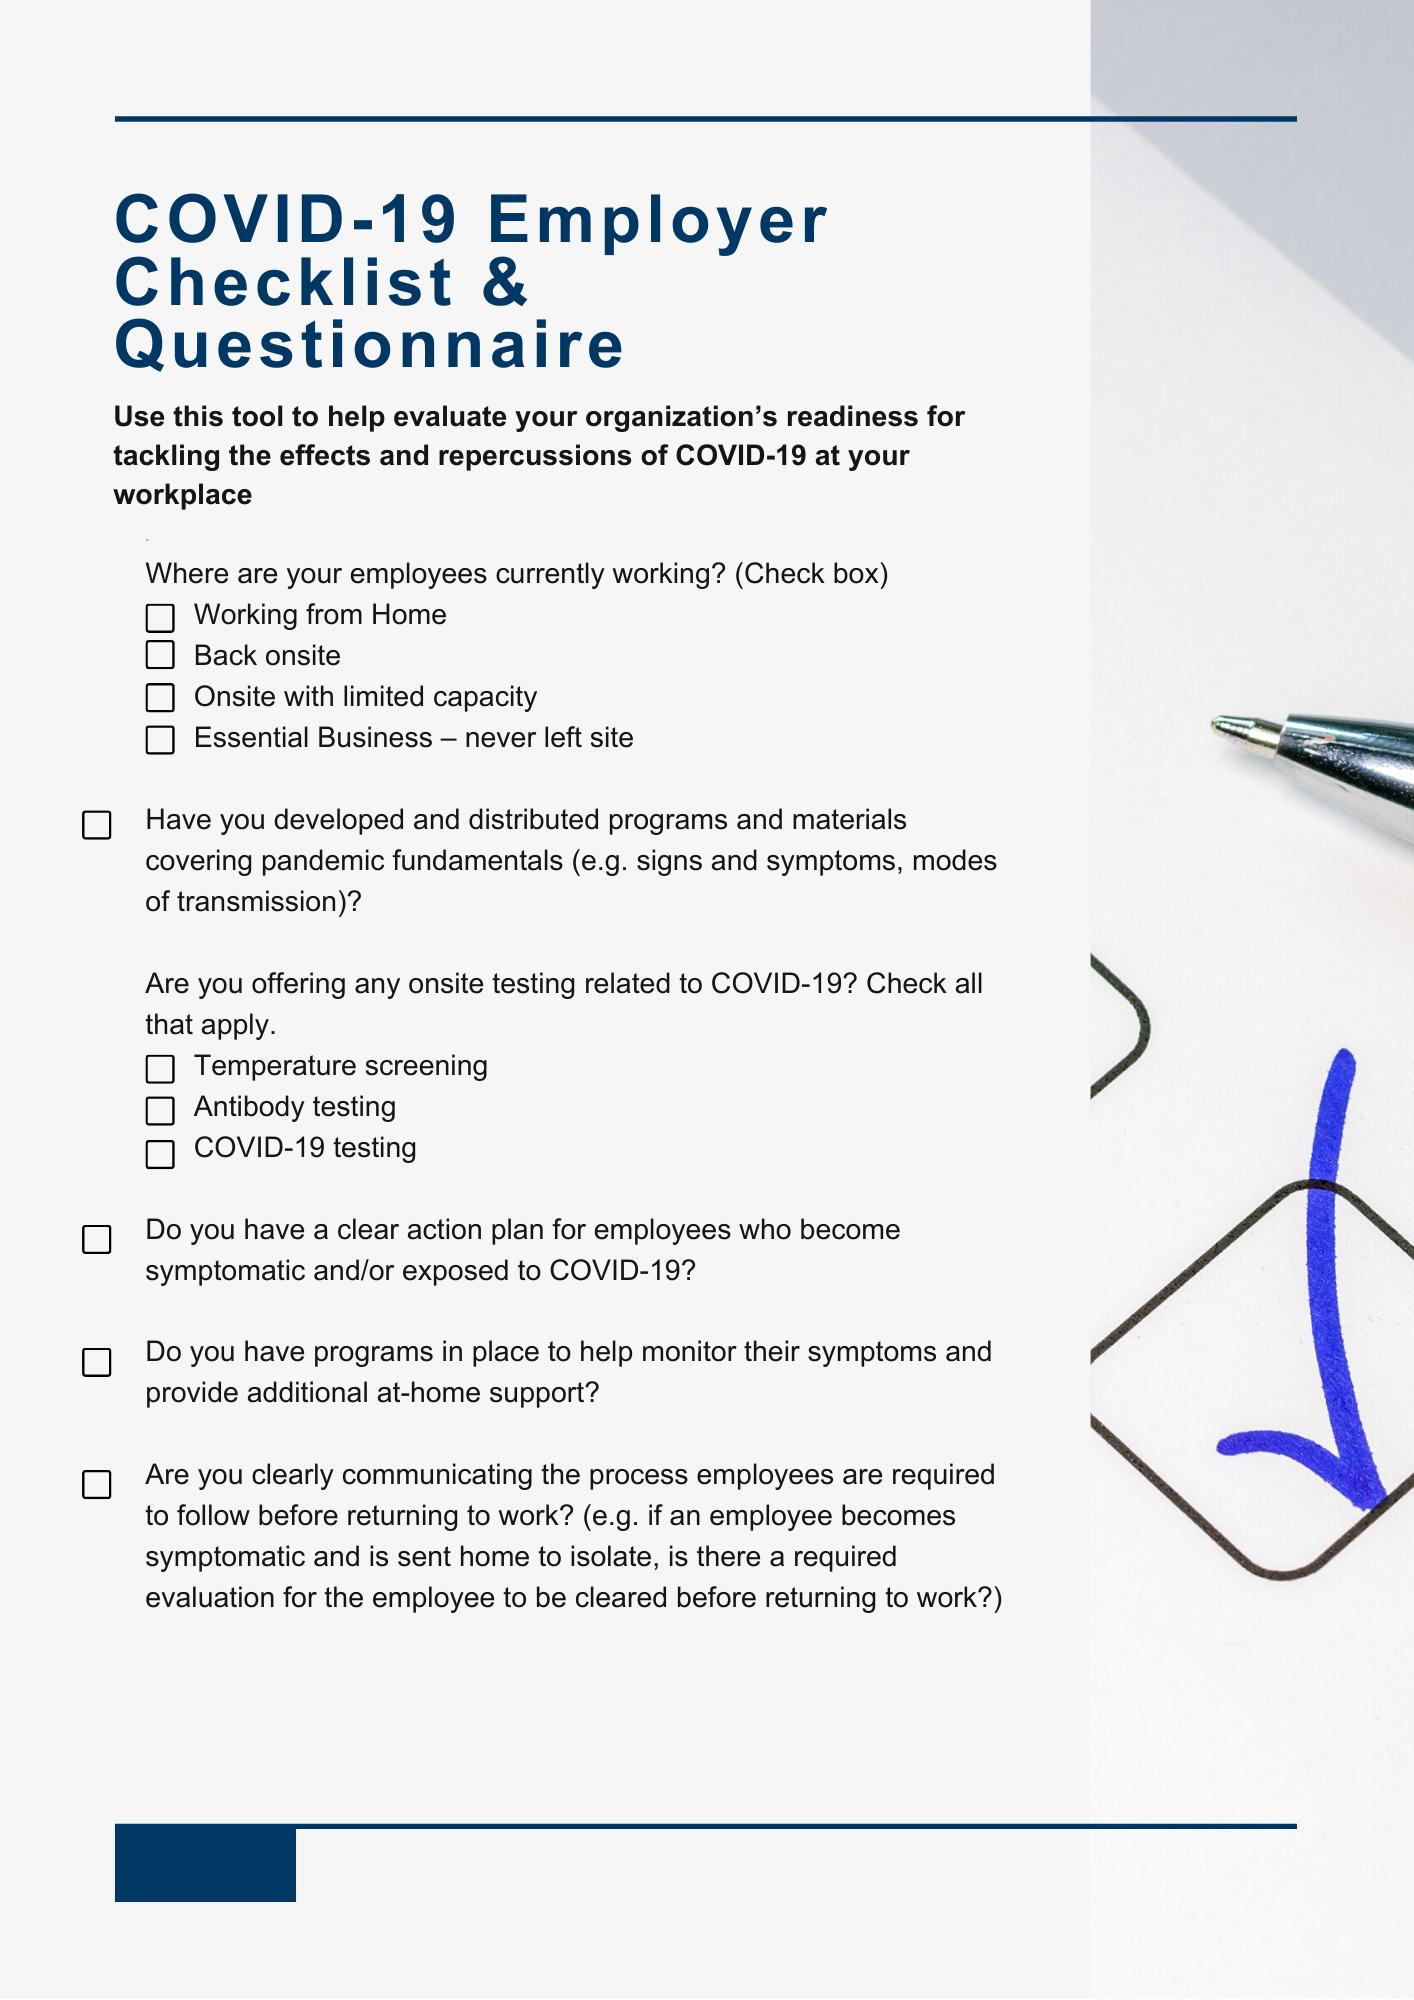 COVID-19 Employer Checklist & Questionnaire